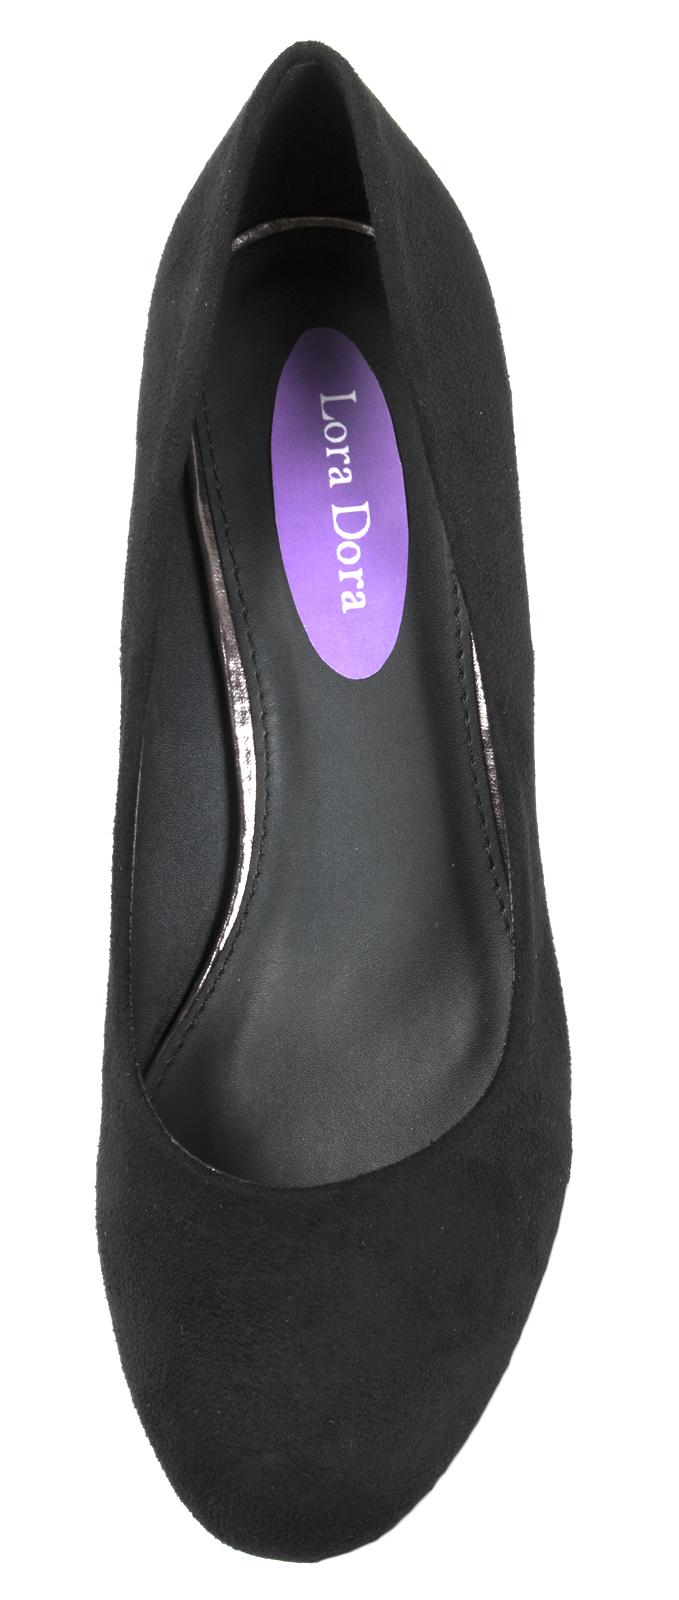 Ladies-Leather-Lined-Low-Block-Heels-Comfort-Work-Office-Court-Shoes-Ladies-Size miniatuur 6